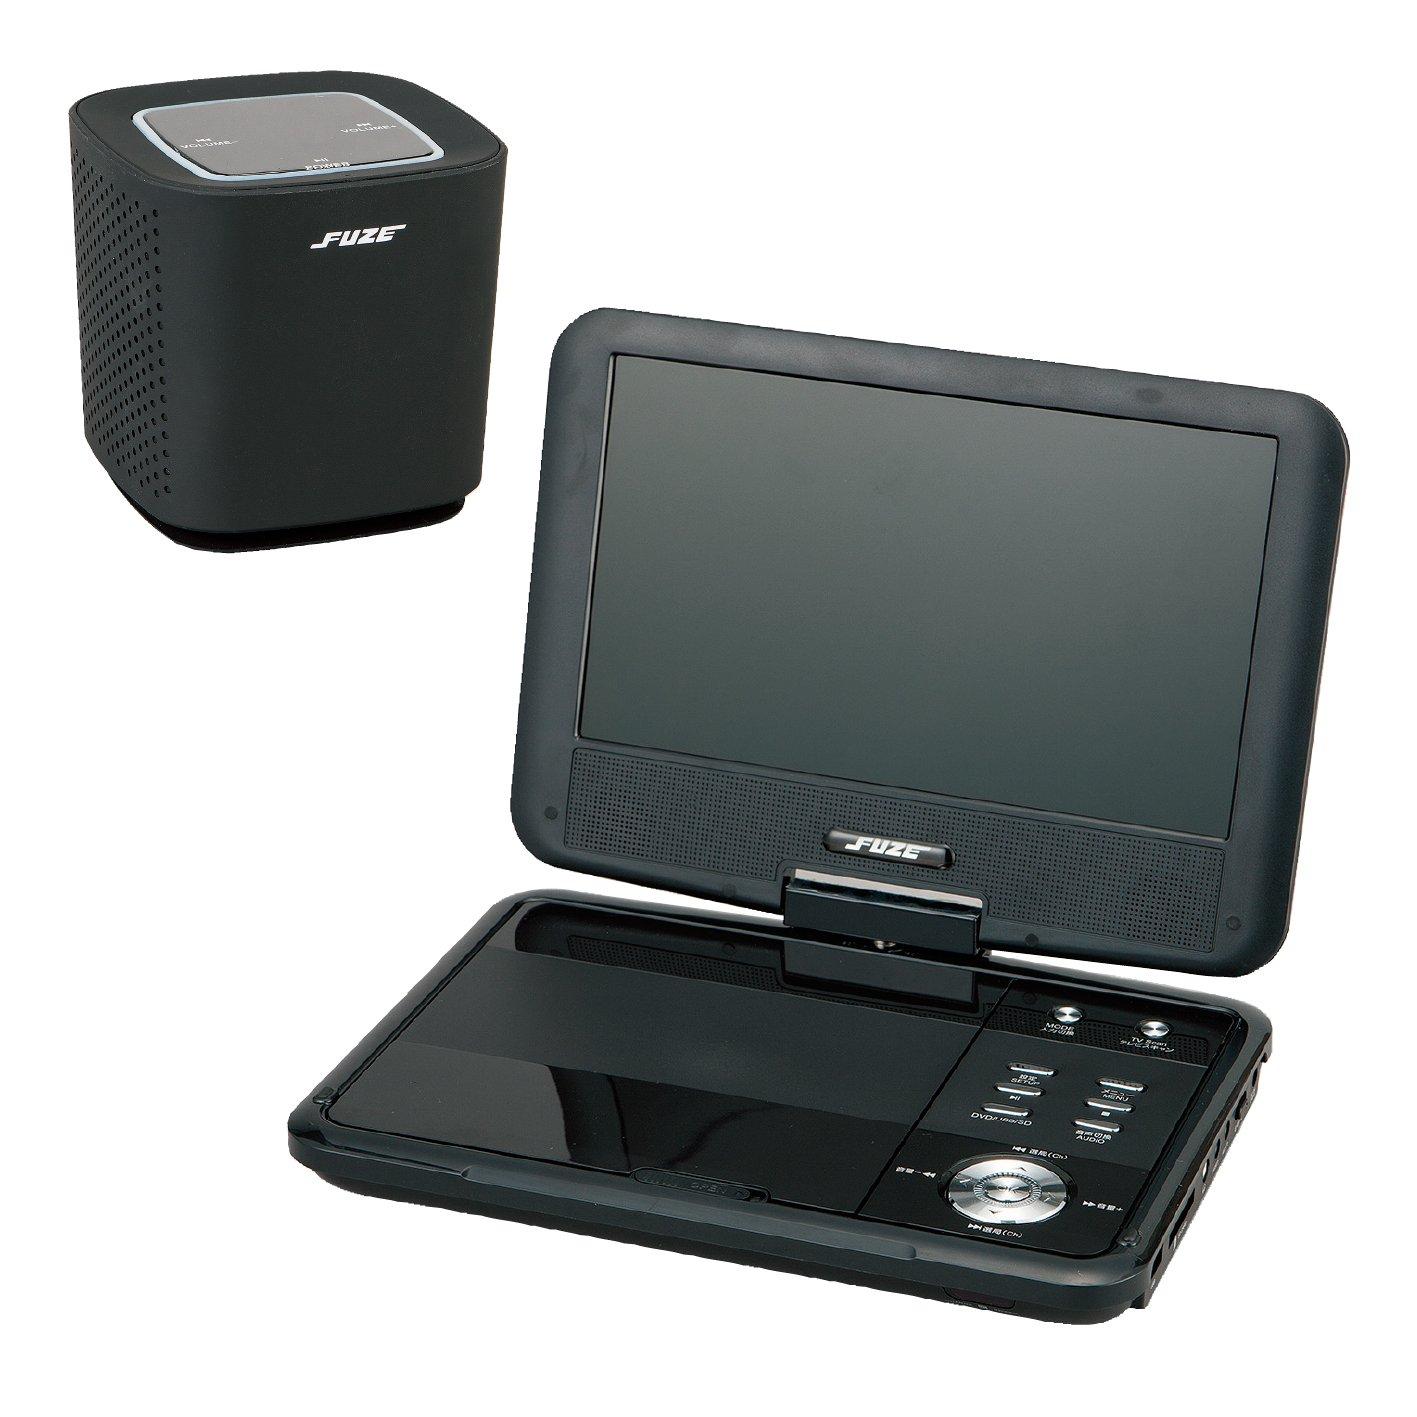 DVDプレーヤーとスピーカー (ブラック) B0728GDH8B ブラック